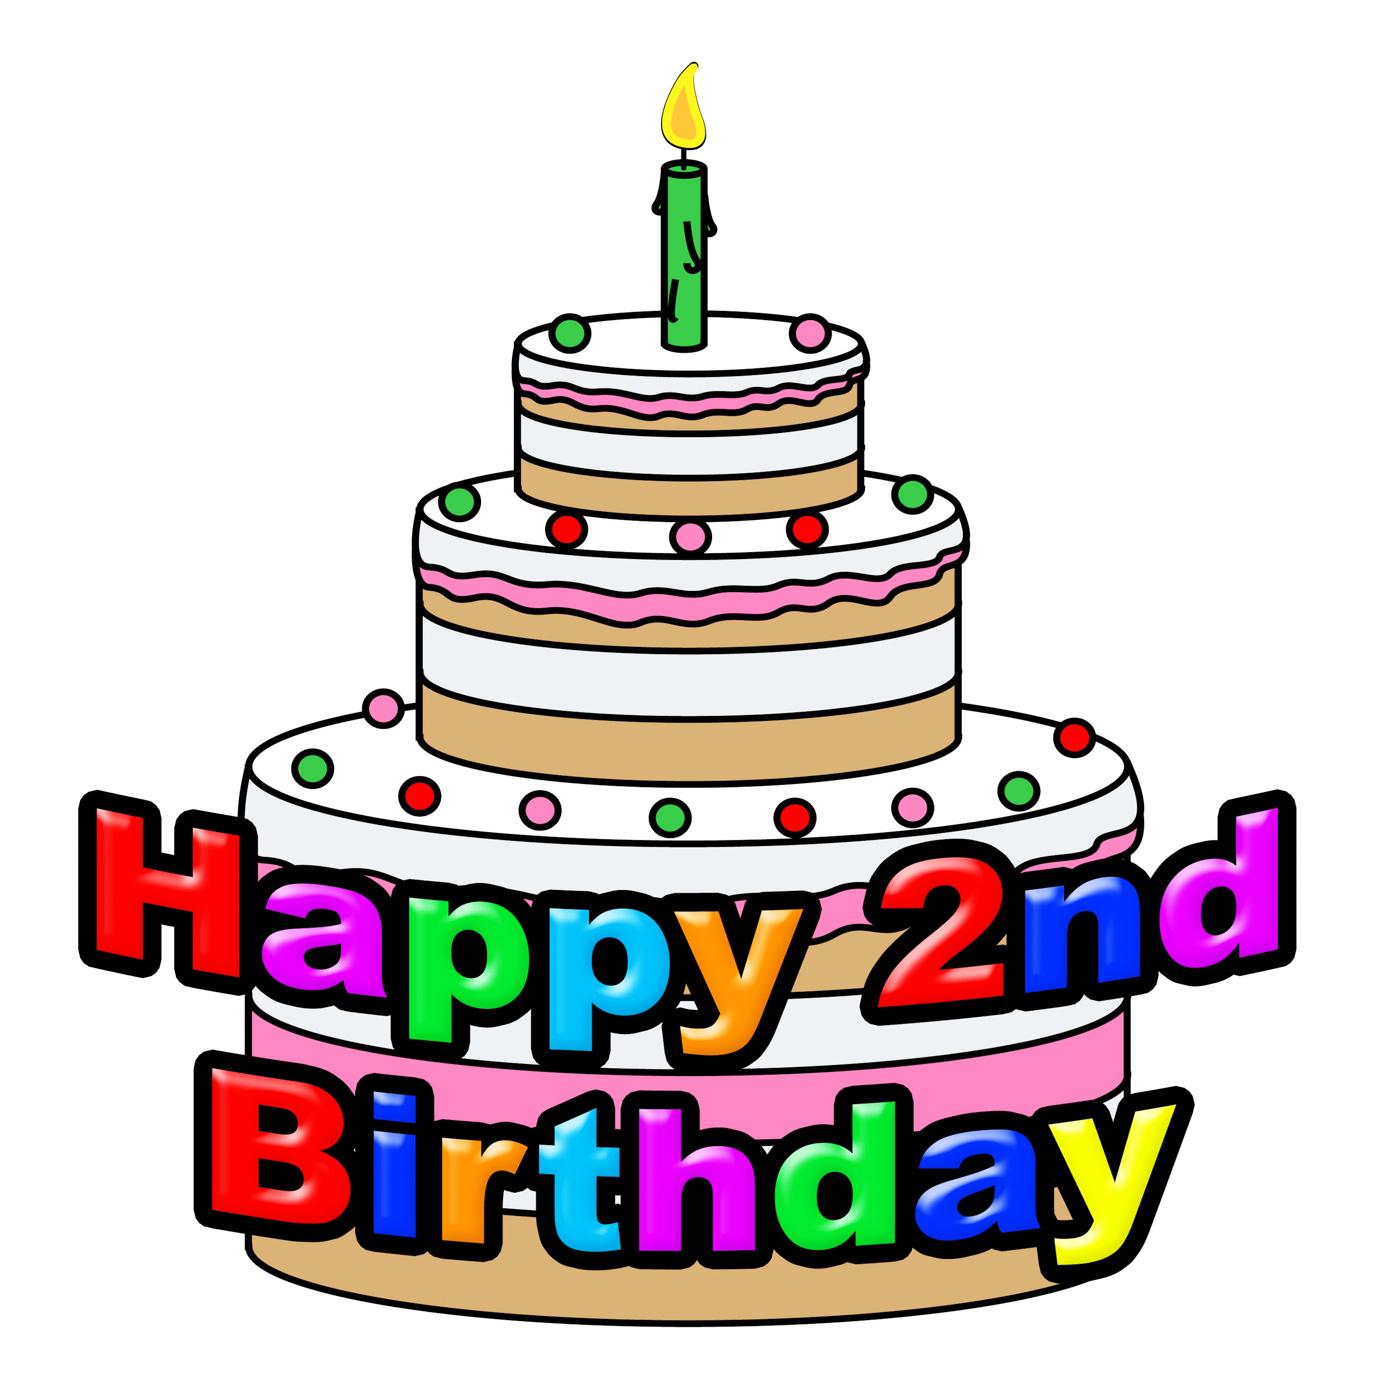 Happy second birthday indicates congratulating celebration and greetin photo